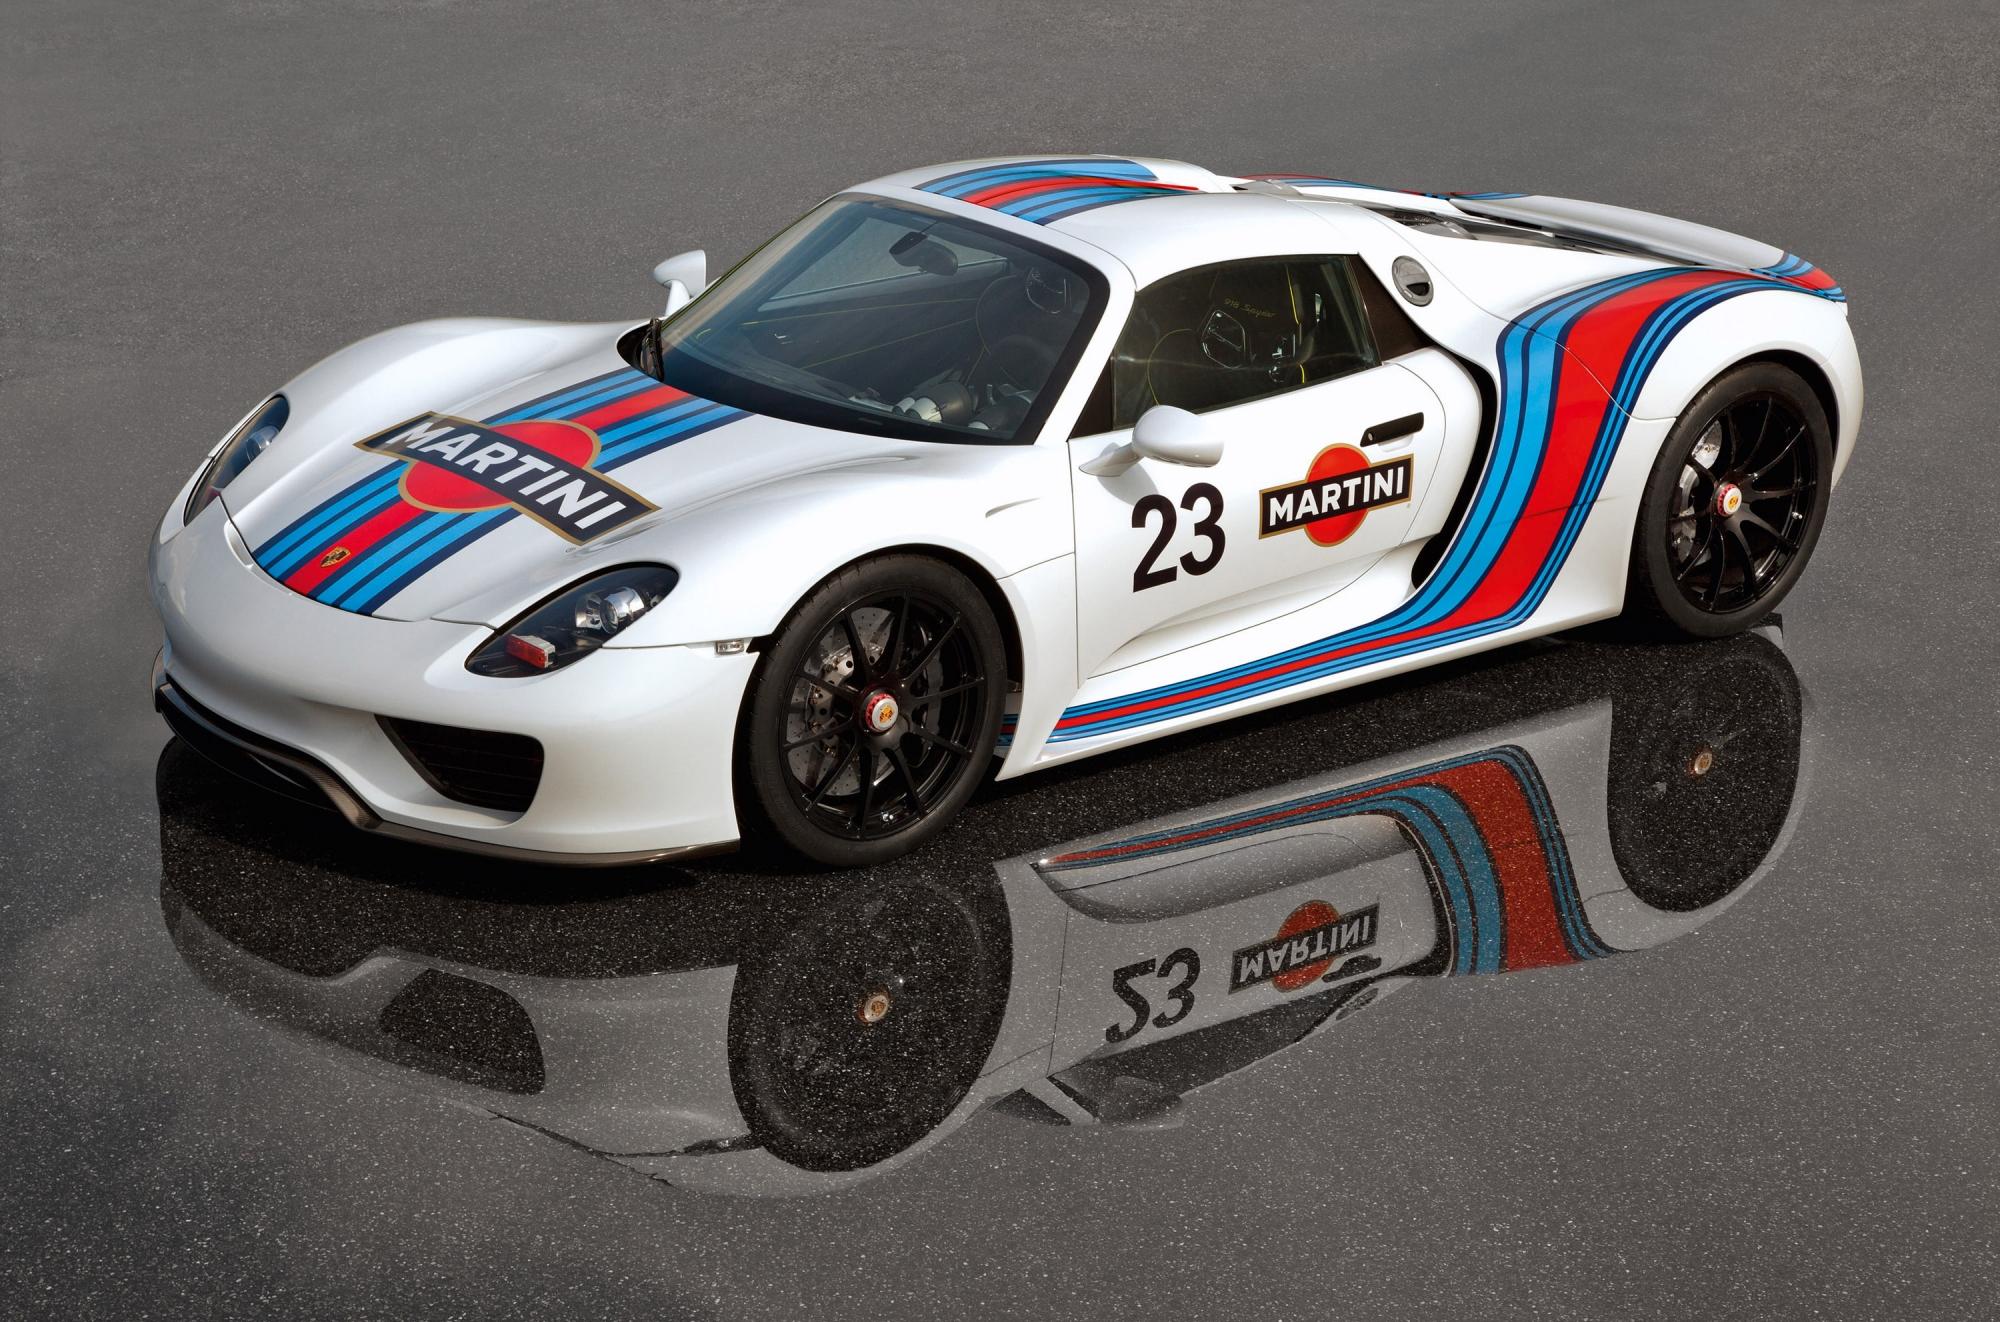 Porsche 918 Rsr Martini Embroidery Speed Boutique